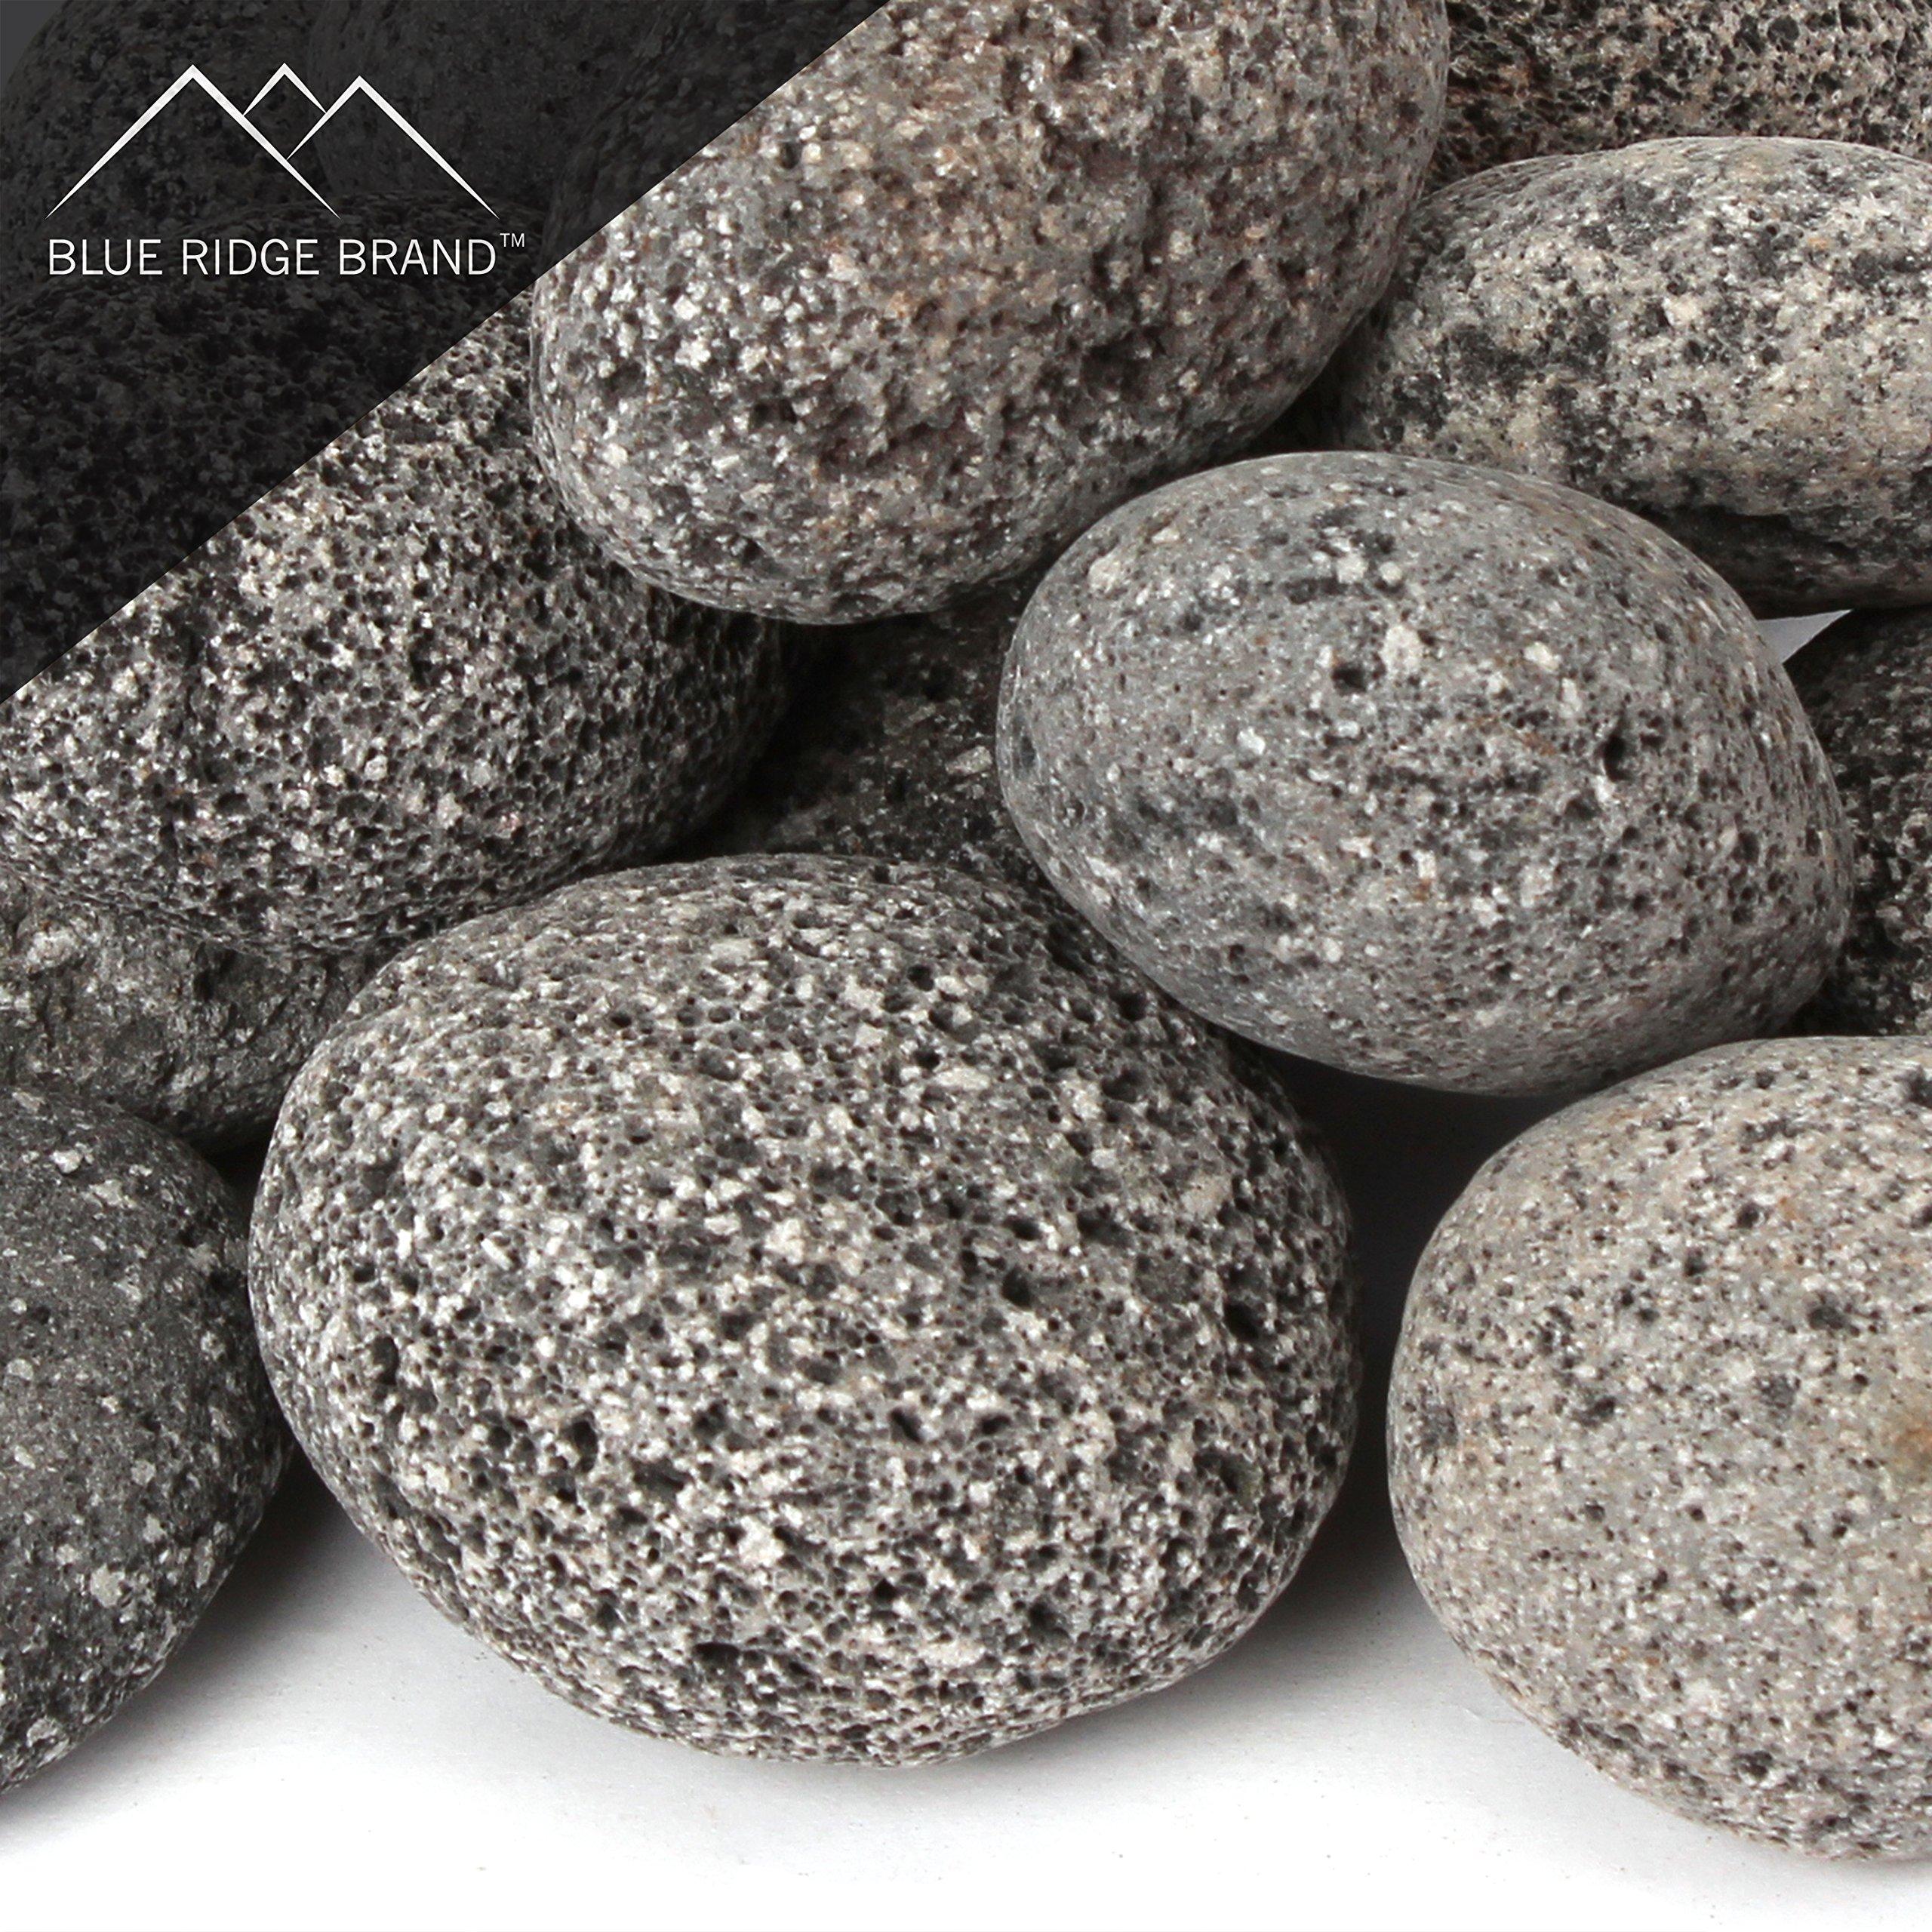 Blue Ridge Brand™ Lava Rock - 50-Pound Tumbled Lava Stones for Fire Pit - 3'' Black/Gray Lava Pebbles - Fire Glass Substitute - Landscaping Rocks by Blue Ridge Brand